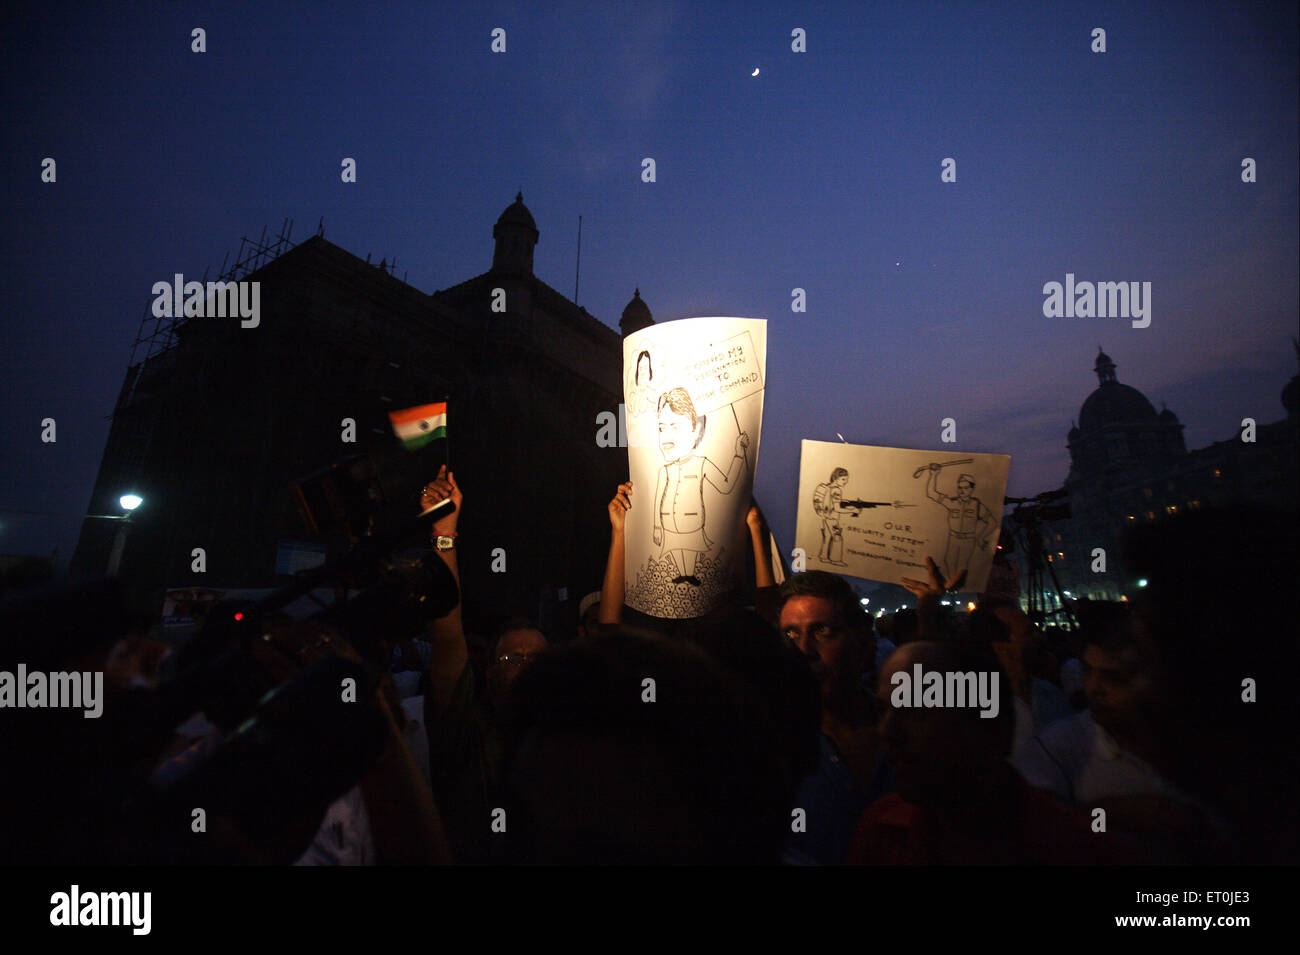 People holding placard cartoons chief minister Maharashtra Vilasrao Deshmukh protest terrorist attack 26th November - Stock Image